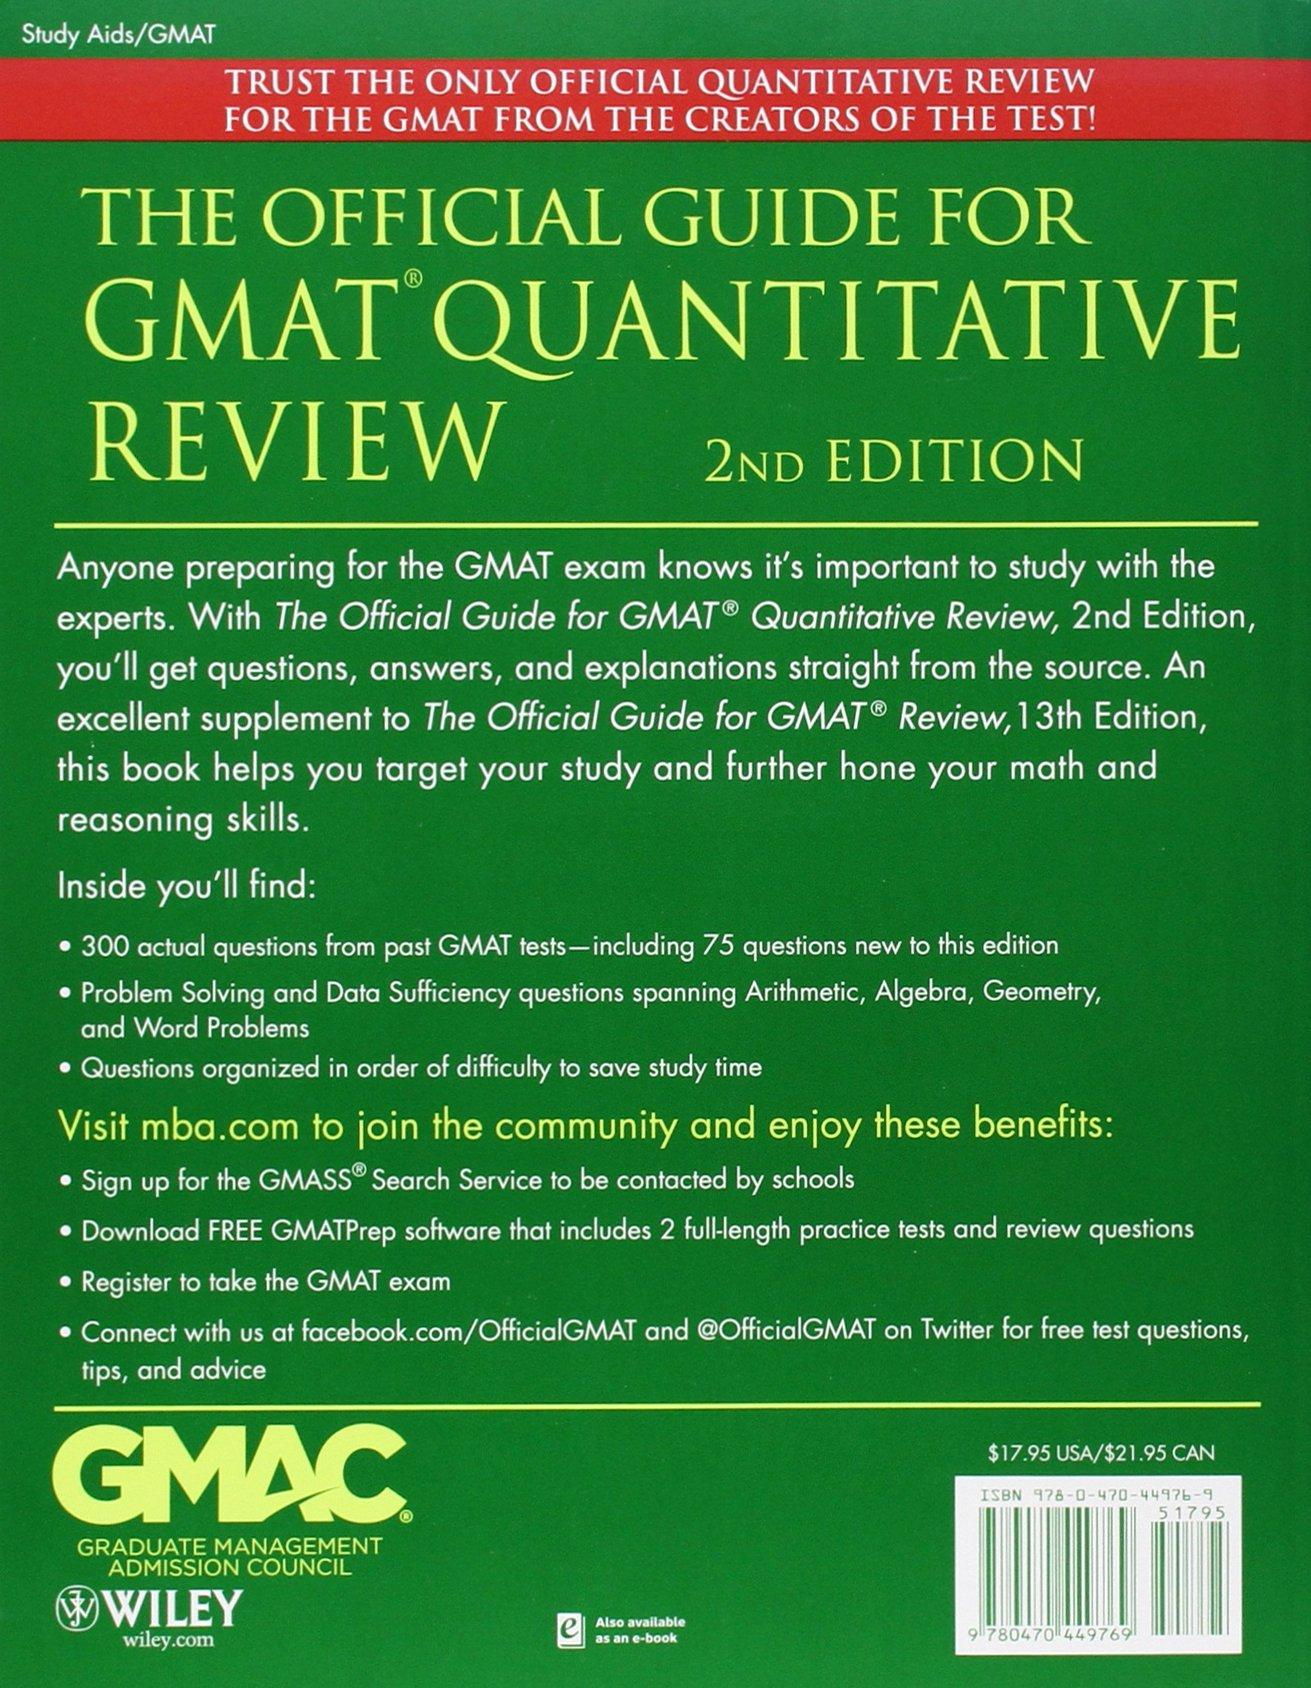 Official Guide For Gmat Quantitative Review Pdf